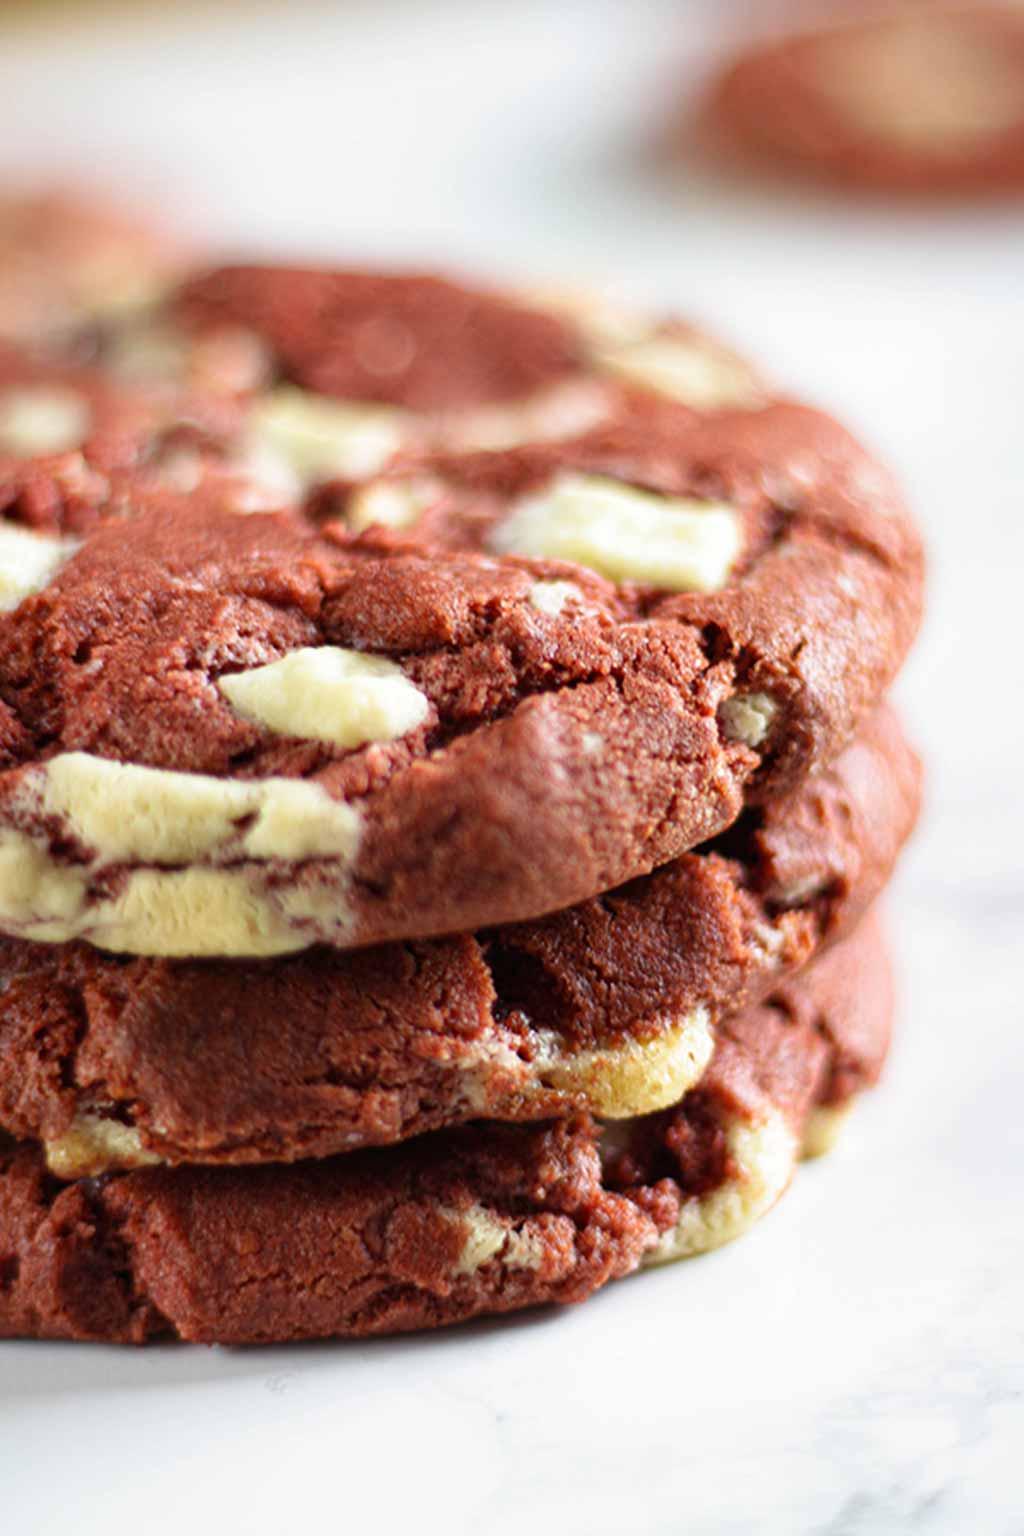 Stack Of 3 red velvet Cookies